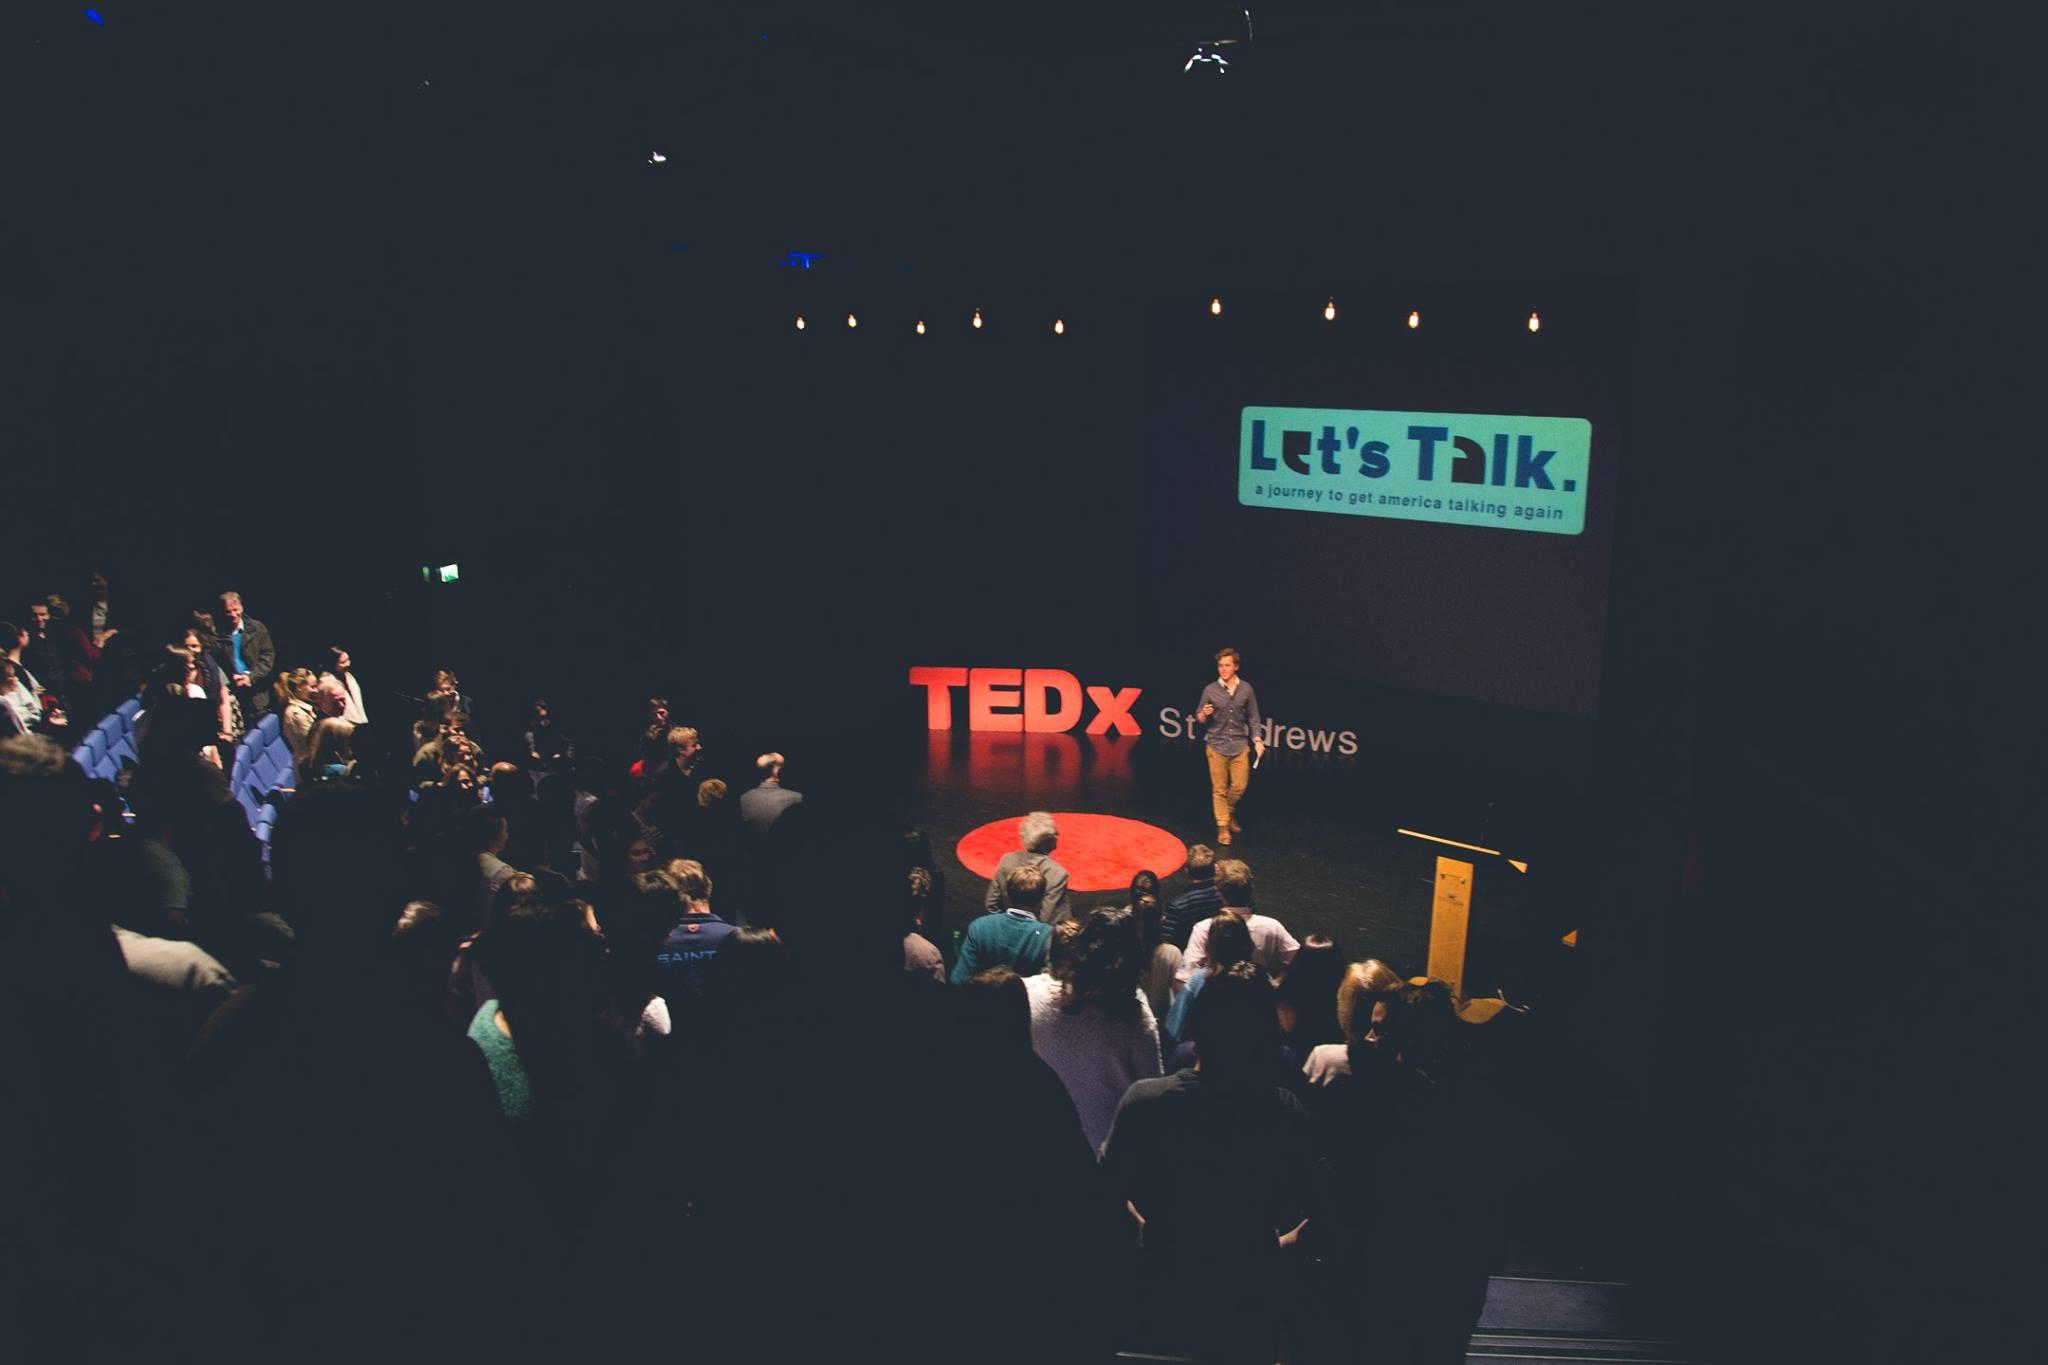 Photo from Tedx 6.jpg